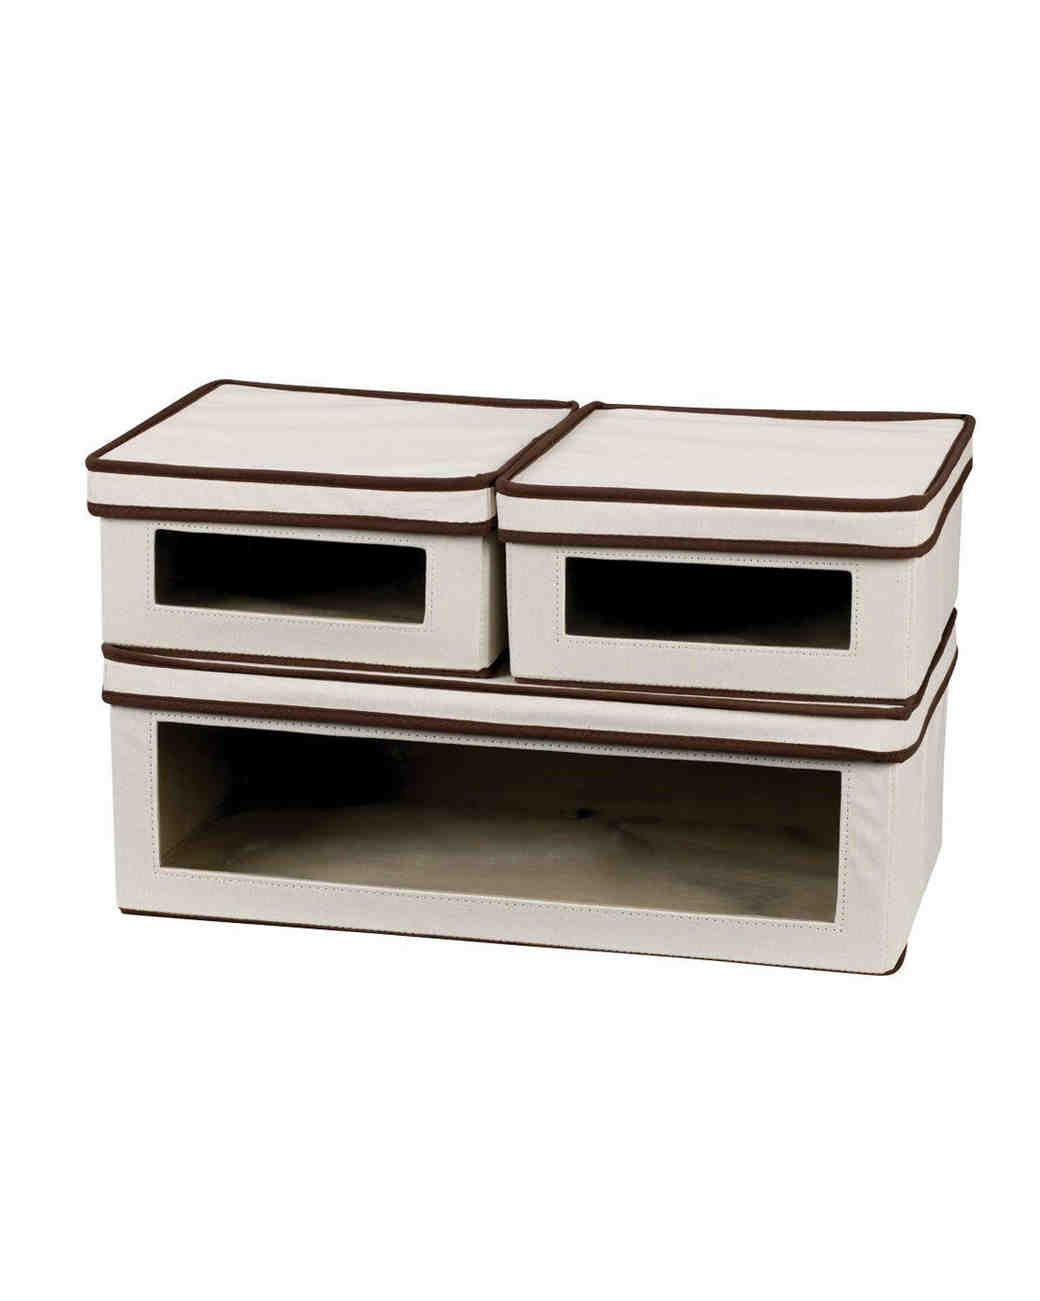 blueprint-team-household-essentials-three-piece-vision-boxes-1015.jpg